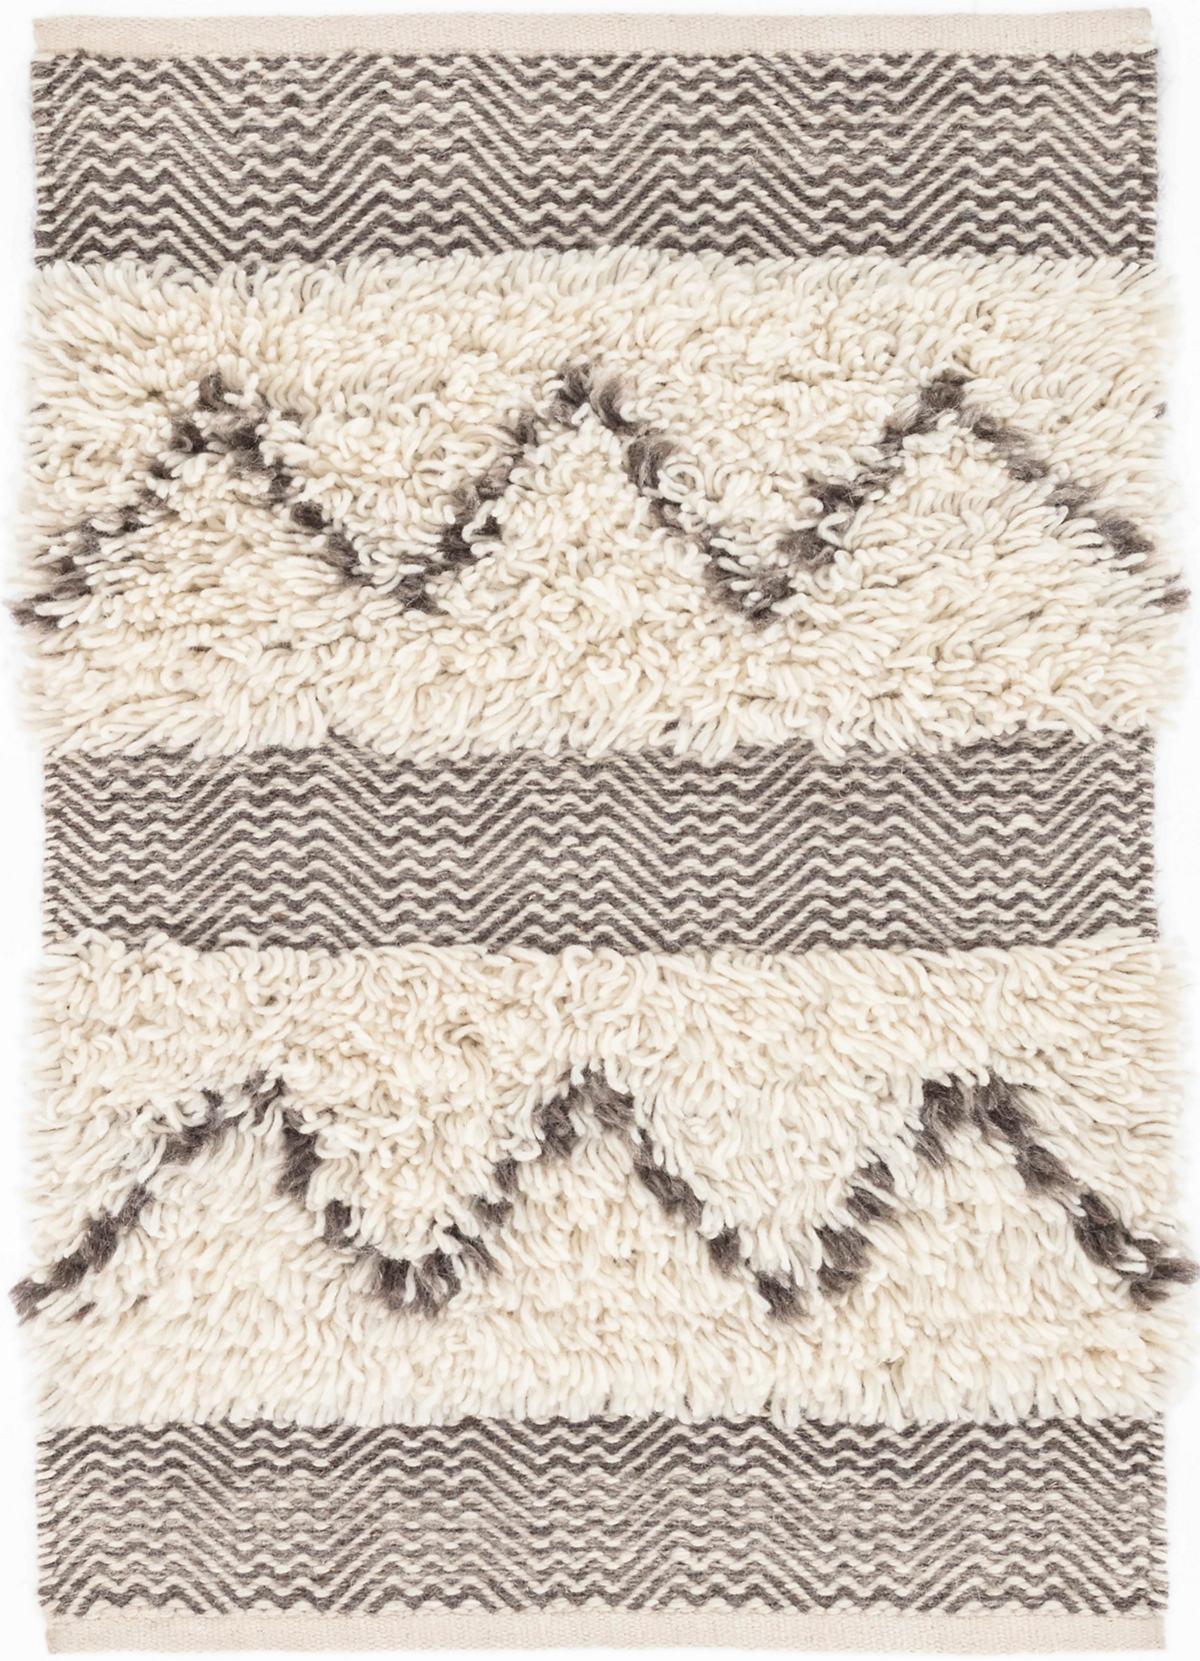 Zags Mocha Woven Wool Rug